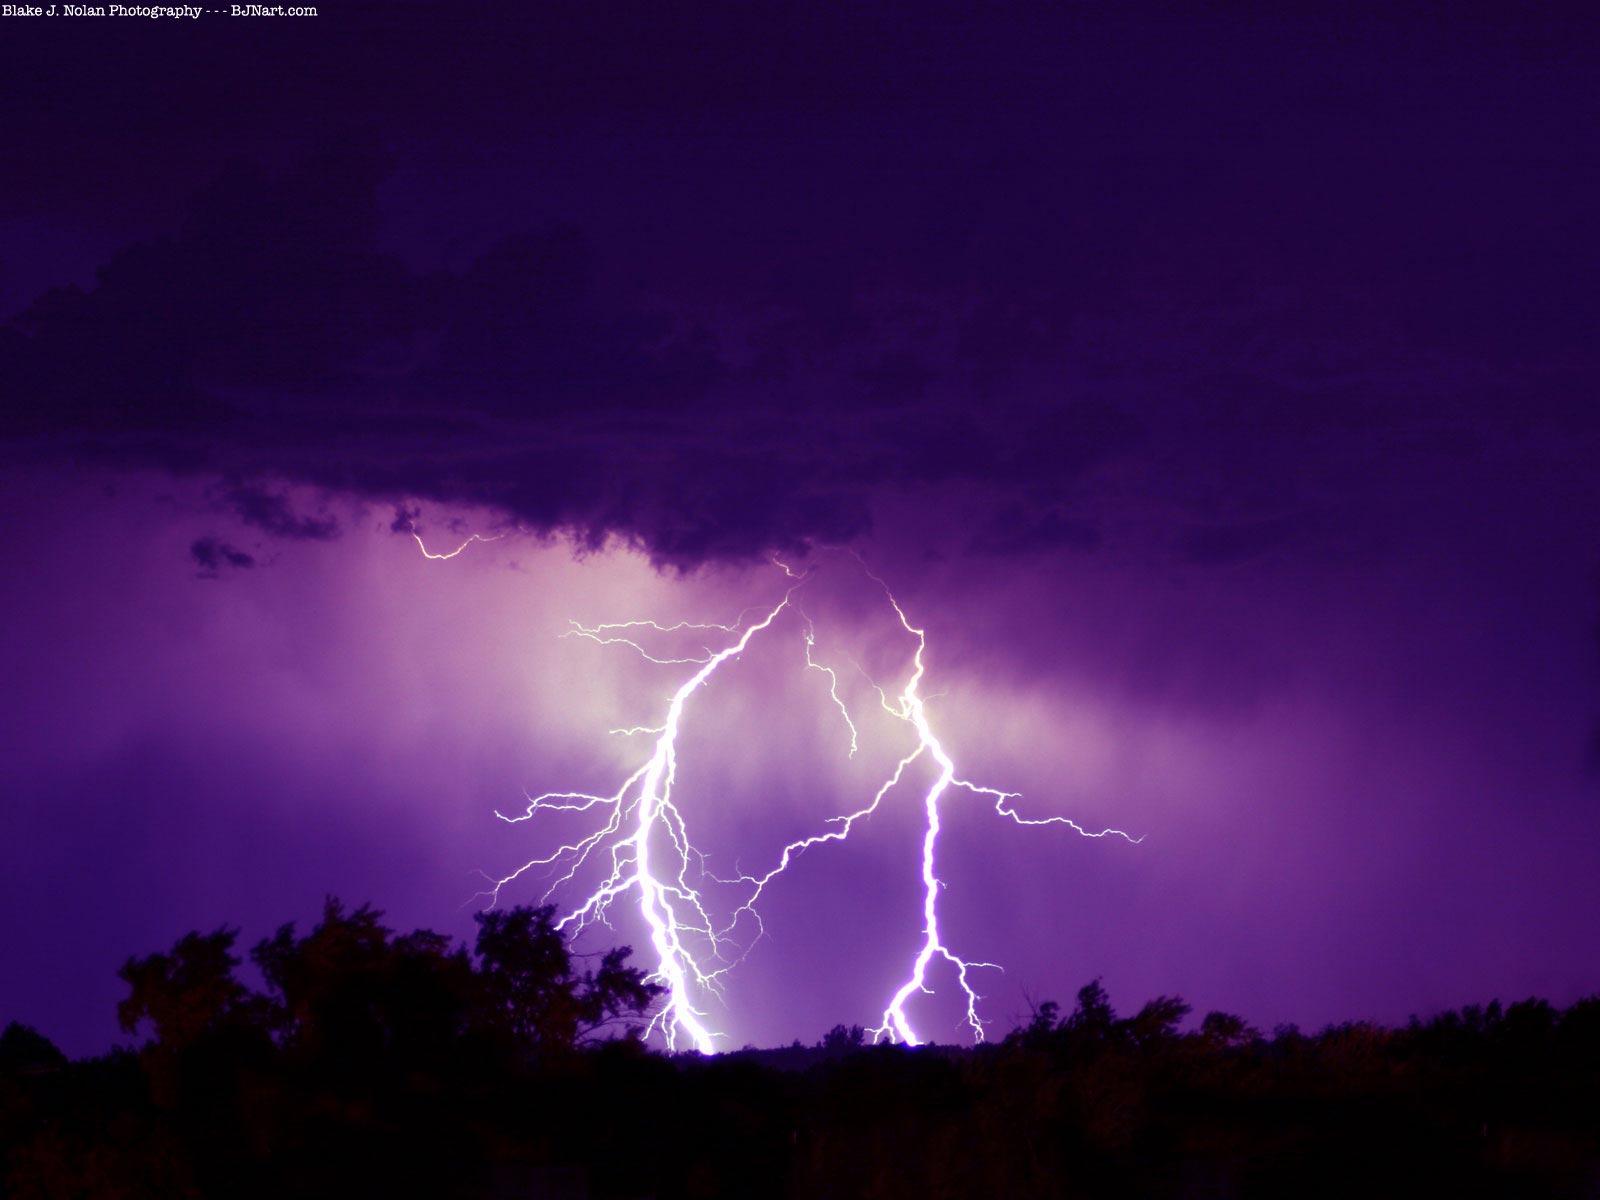 Images of Lightening | 1600x1200